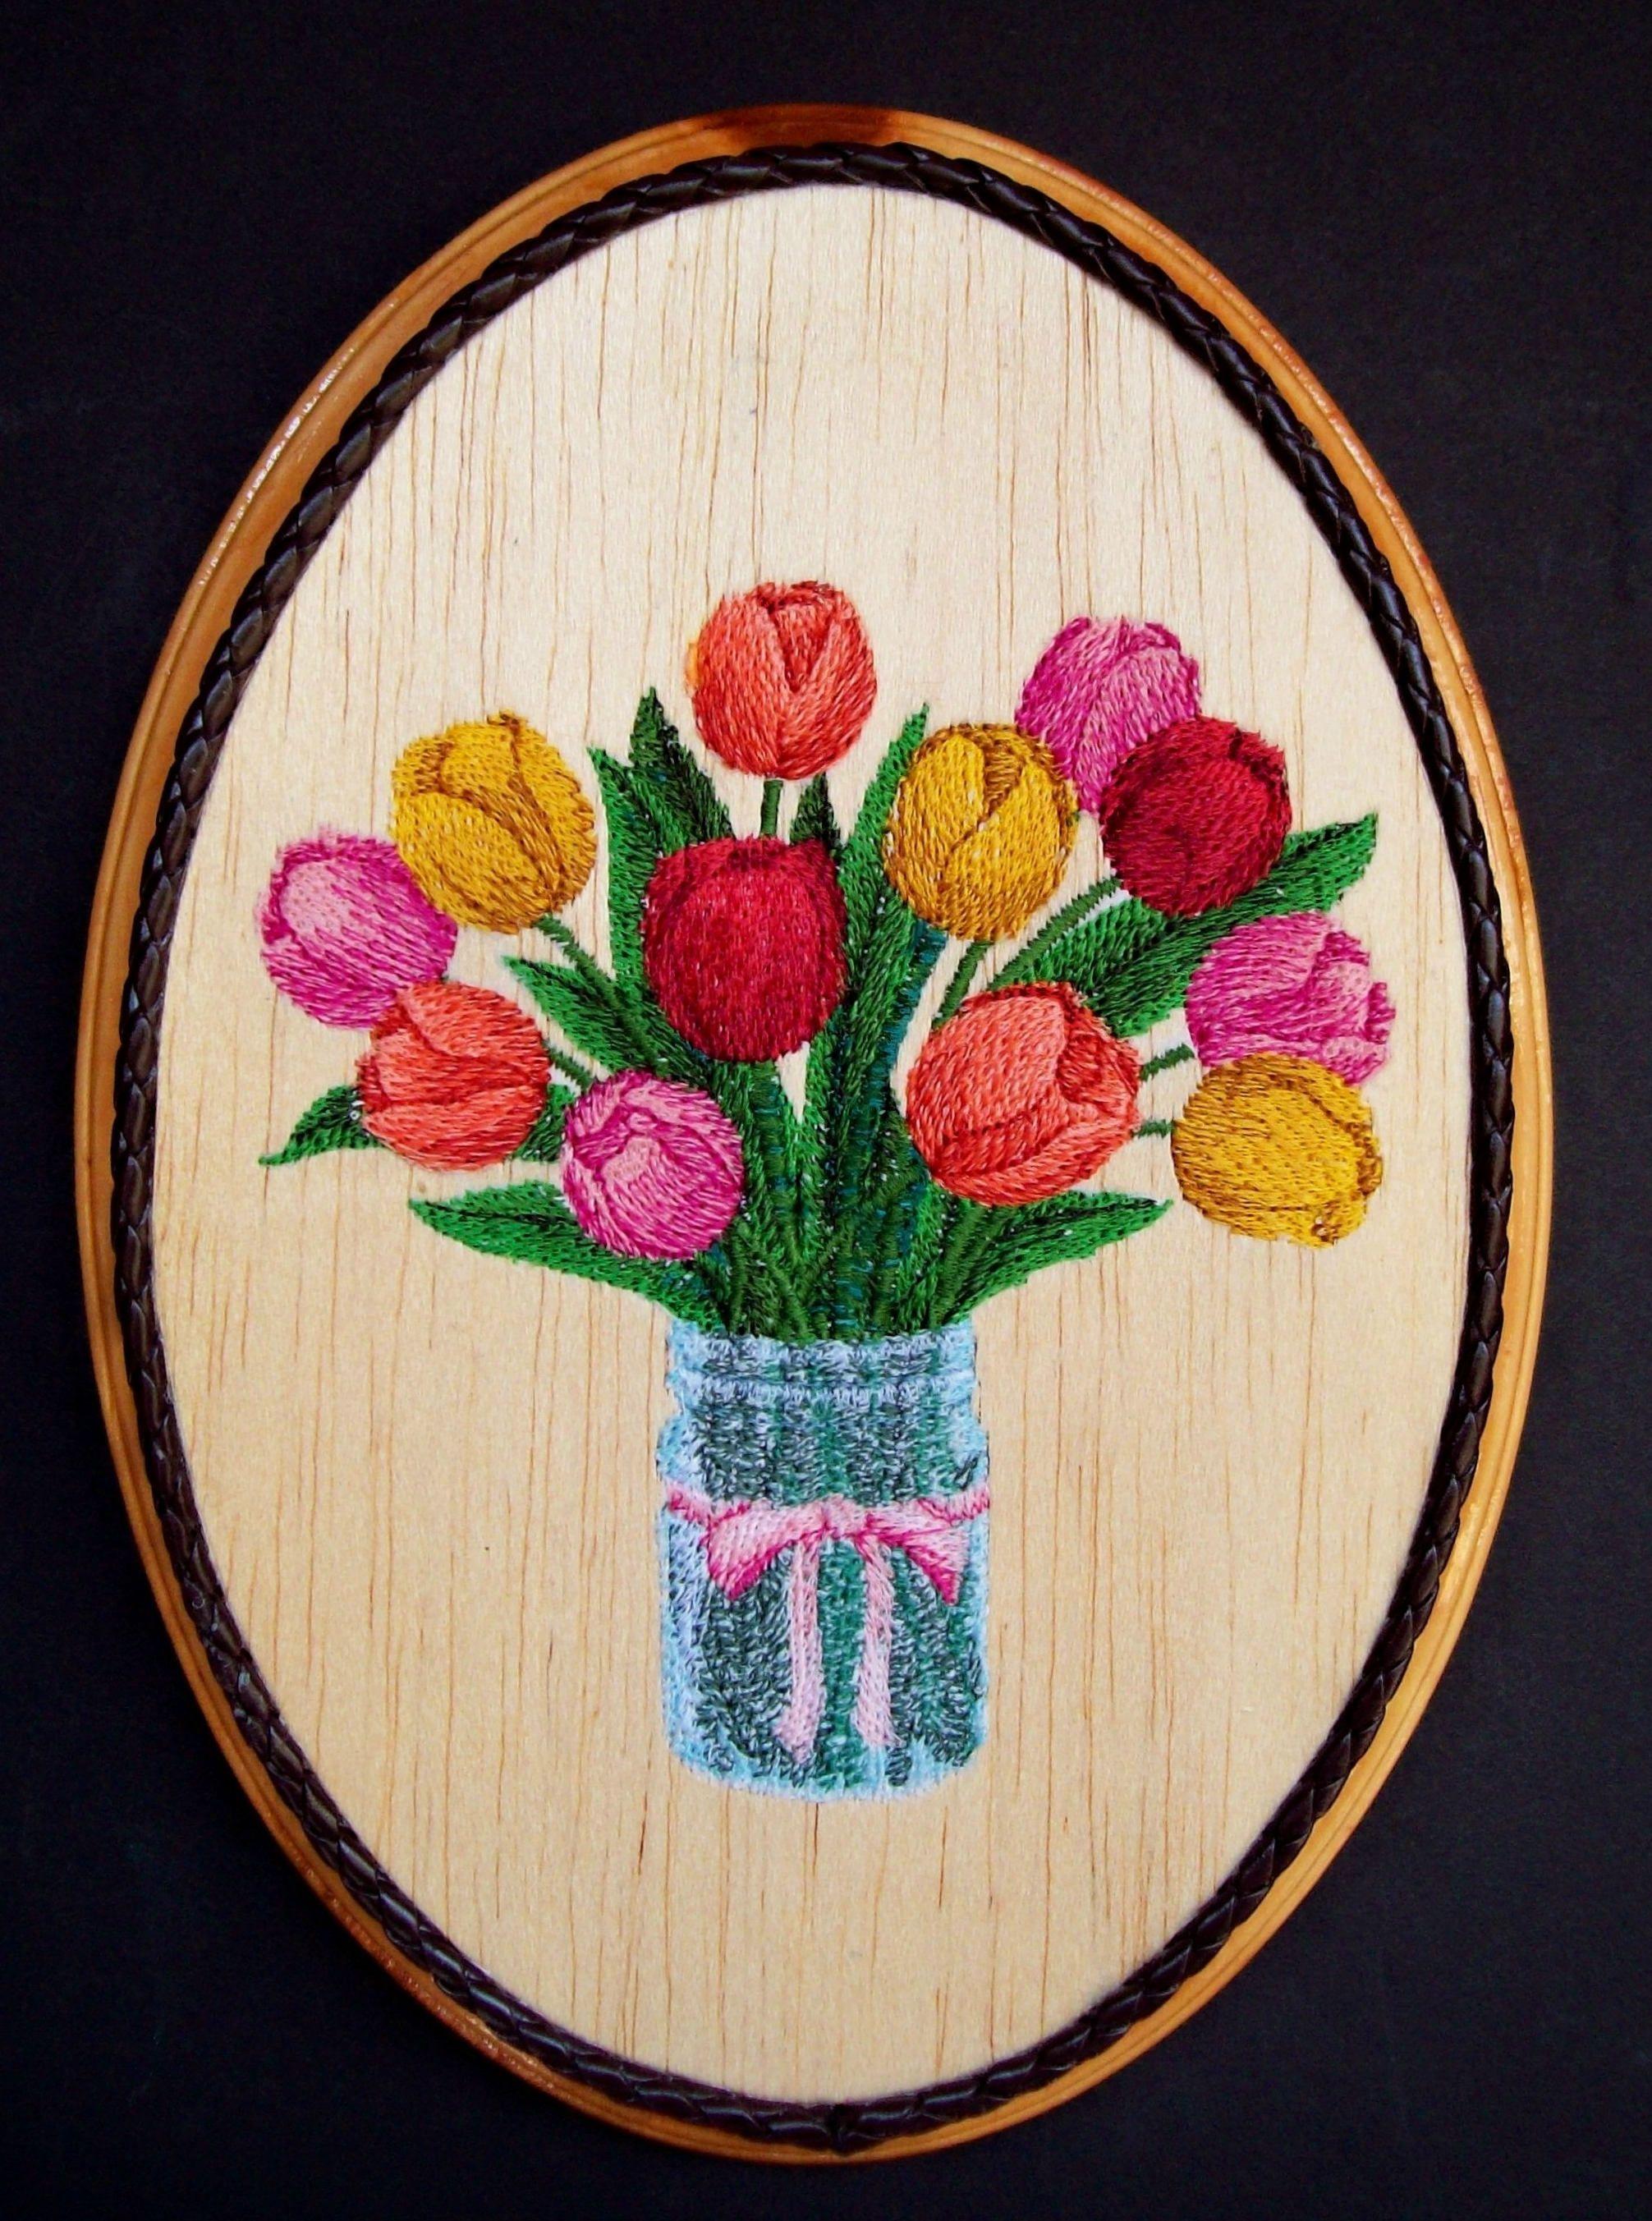 Garden wall art flowers  Mason Jar Tulips Embroidery Wood Art Country Kitchen Decor Cottage